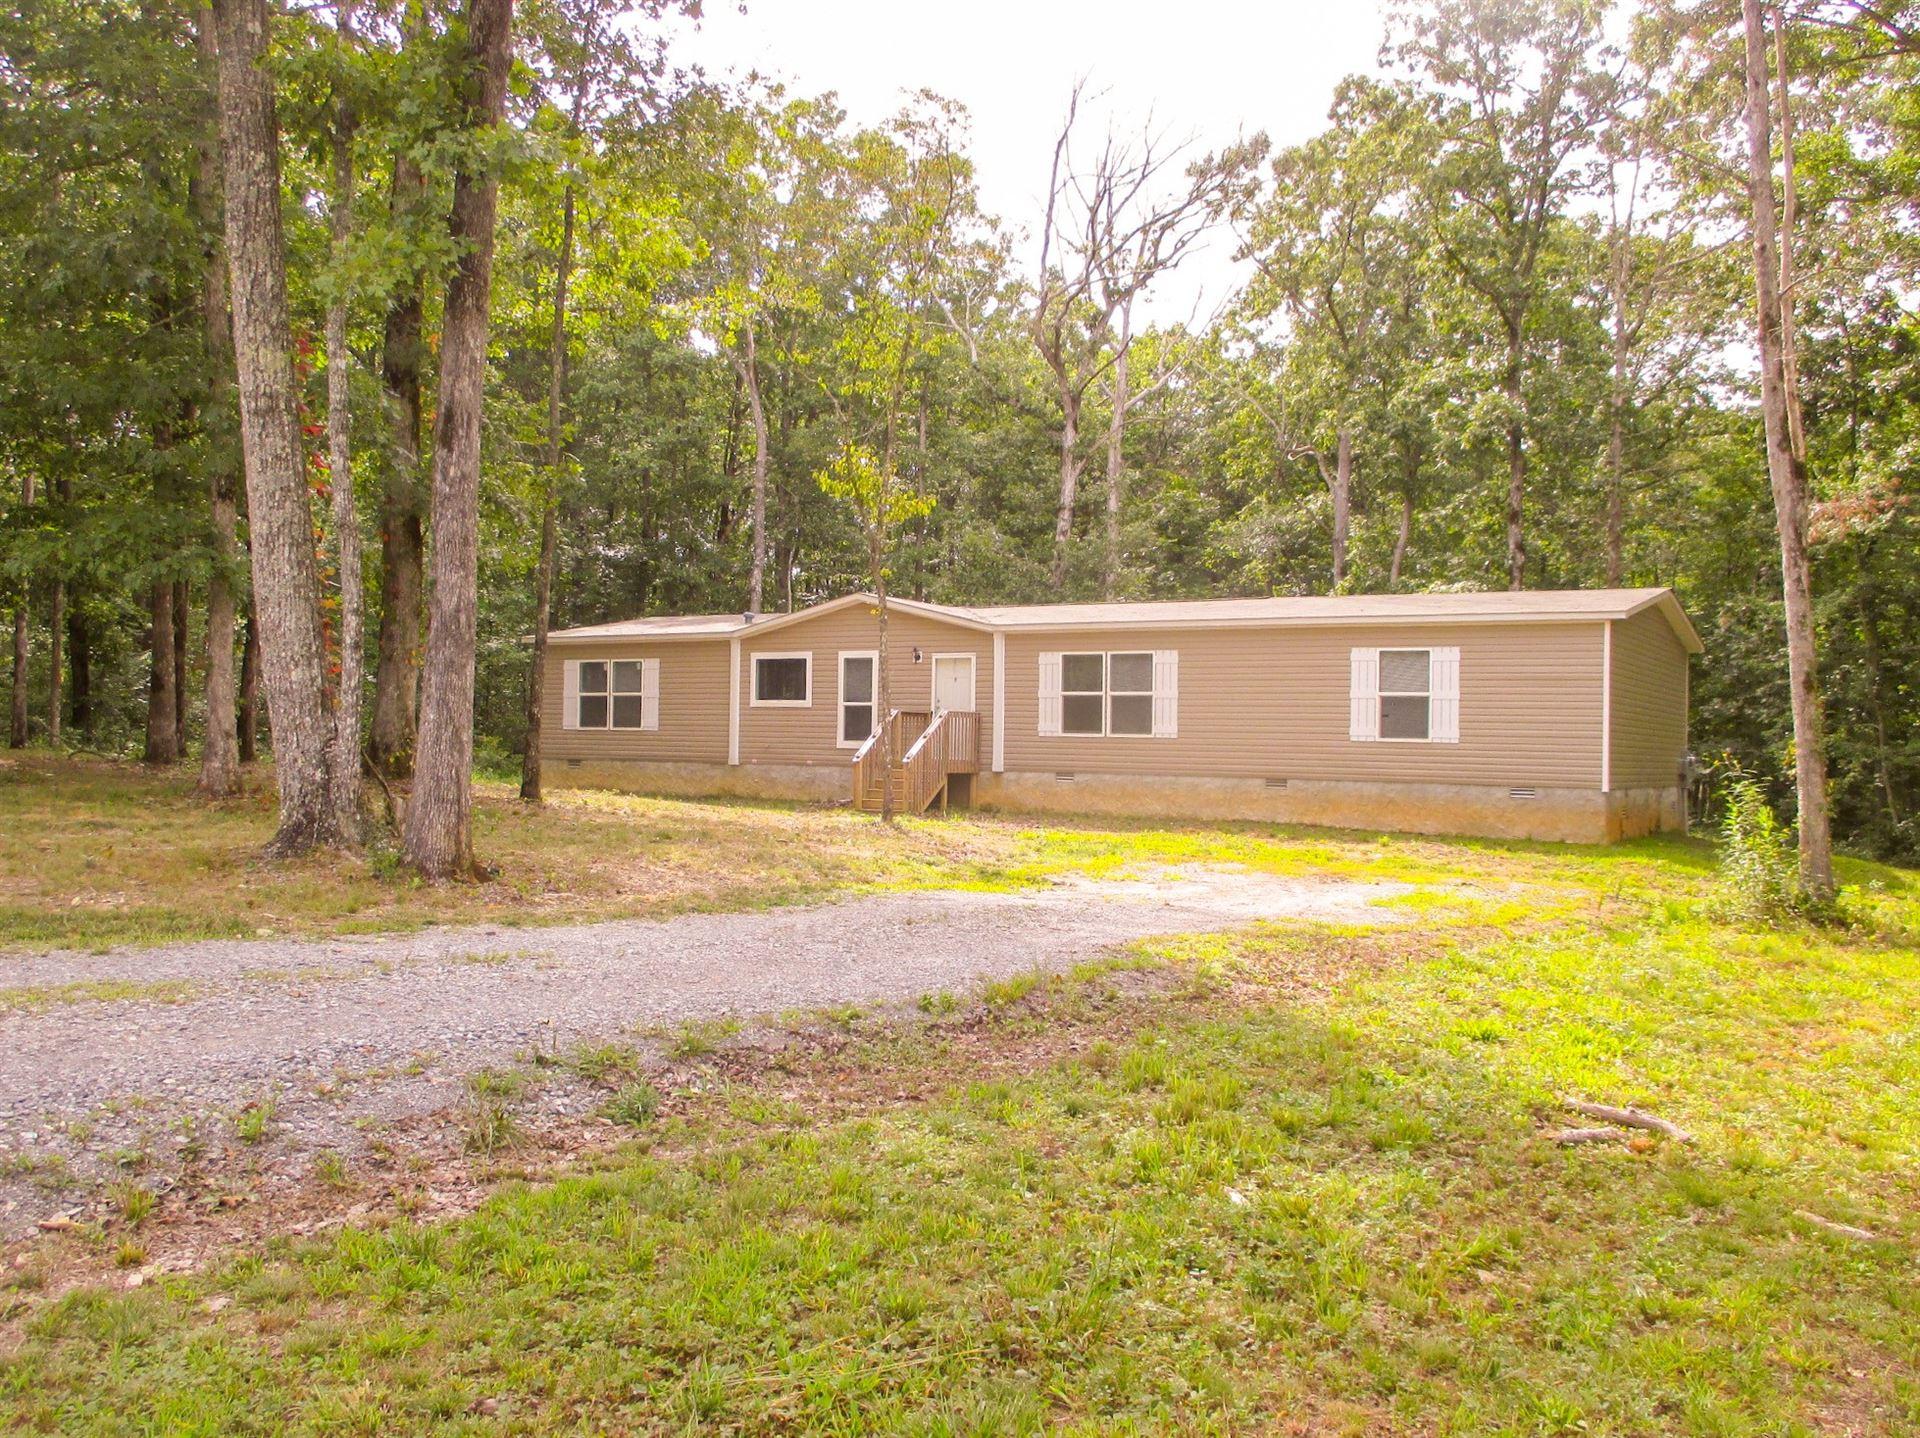 1039 Summerfield Rd, Monteagle, TN 37356 - MLS#: 2184433